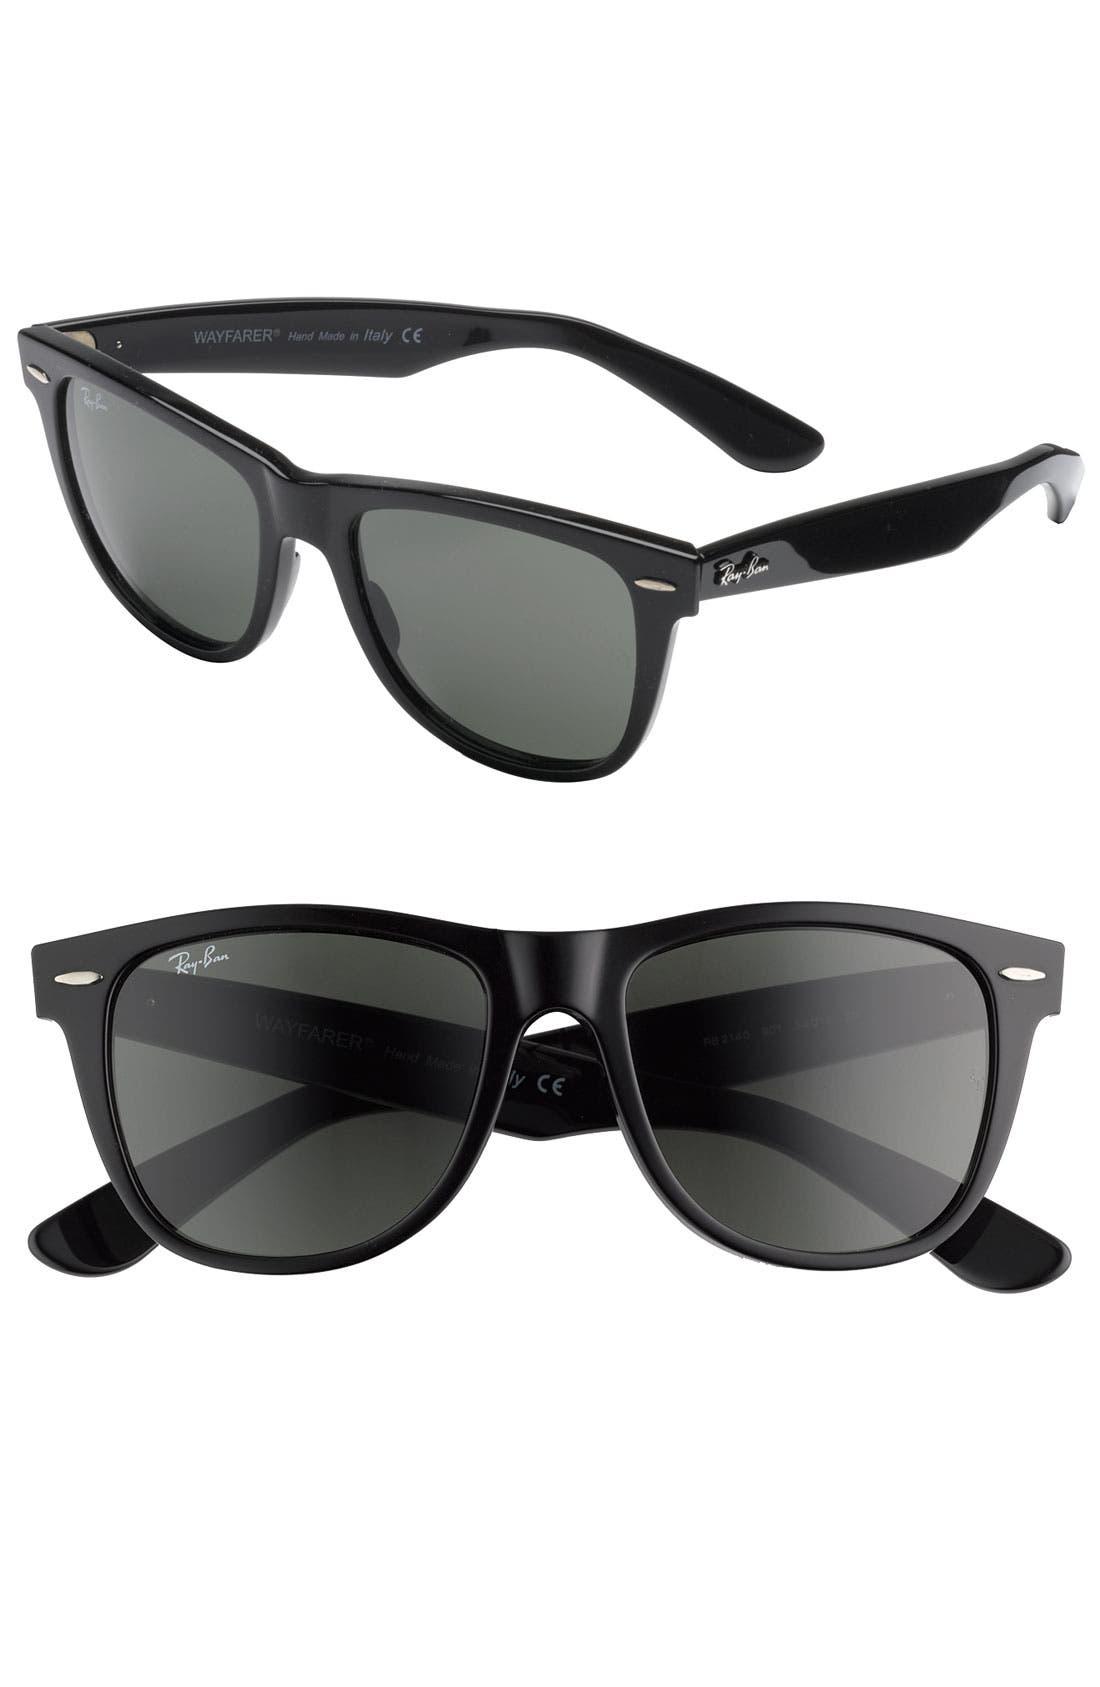 Alternate Image 1 Selected - Ray-Ban 'Classic Wayfarer' 50mm Polarized Sunglasses